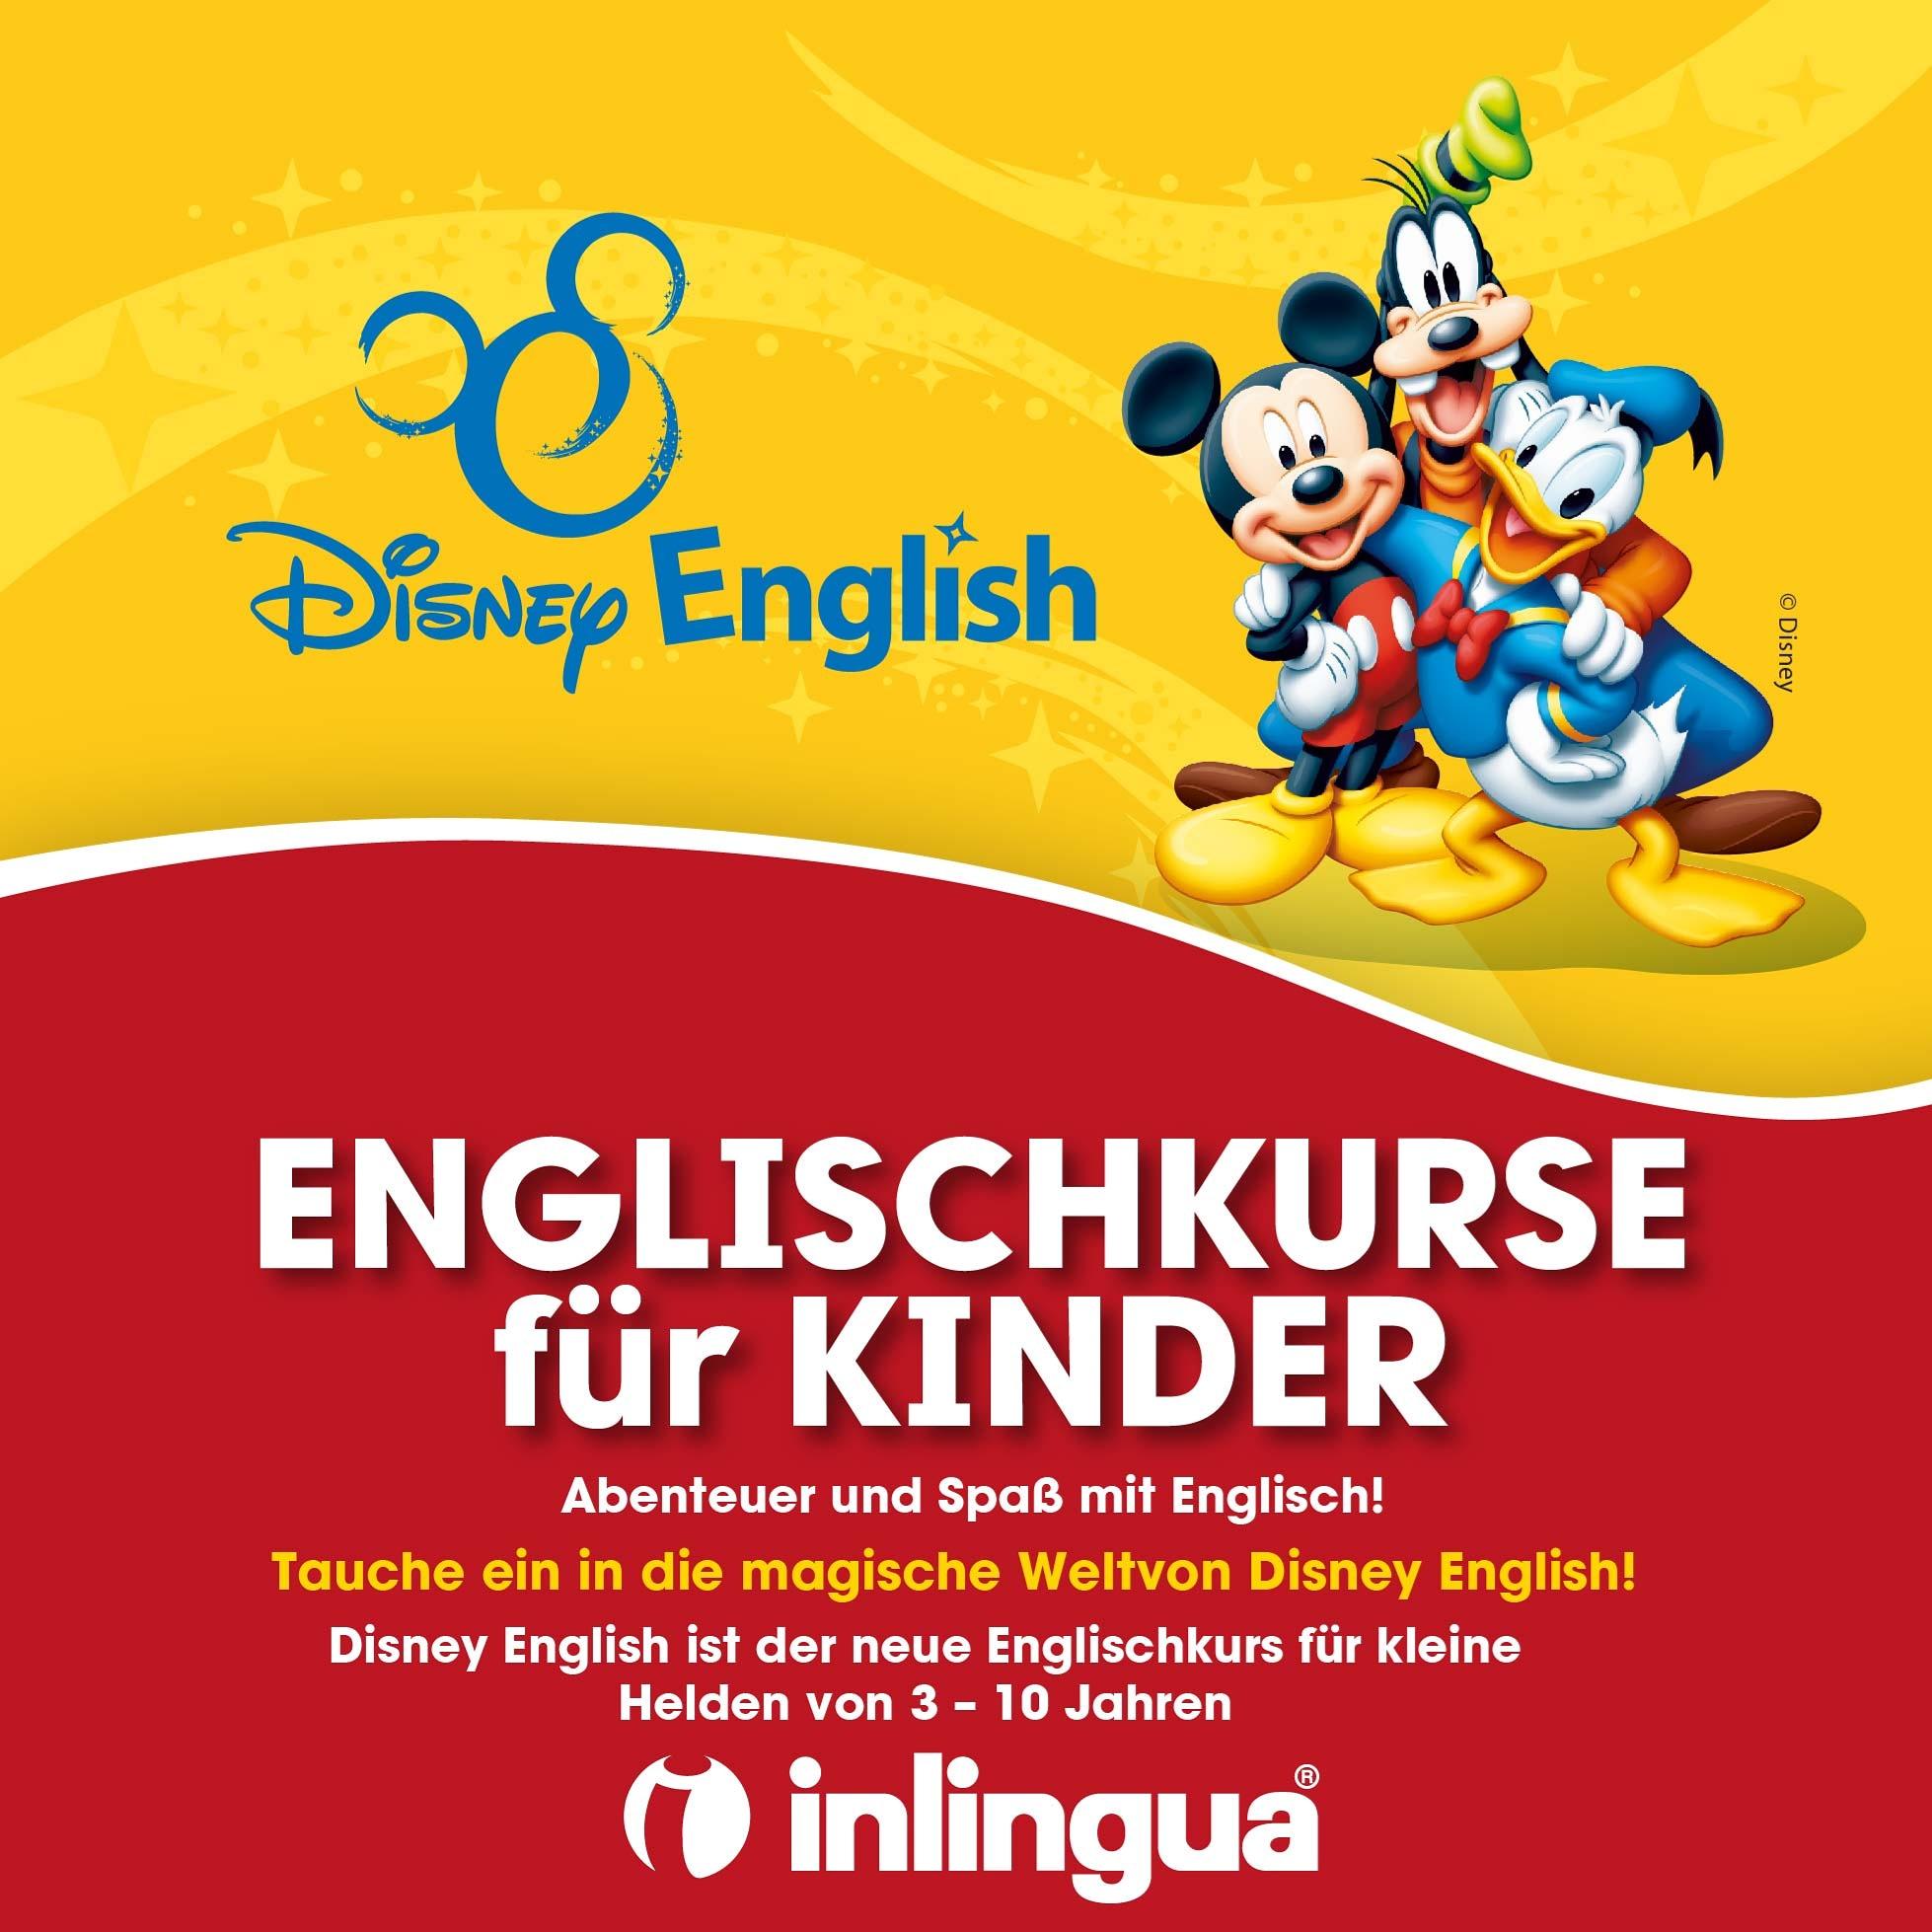 inlingua Sprachschule